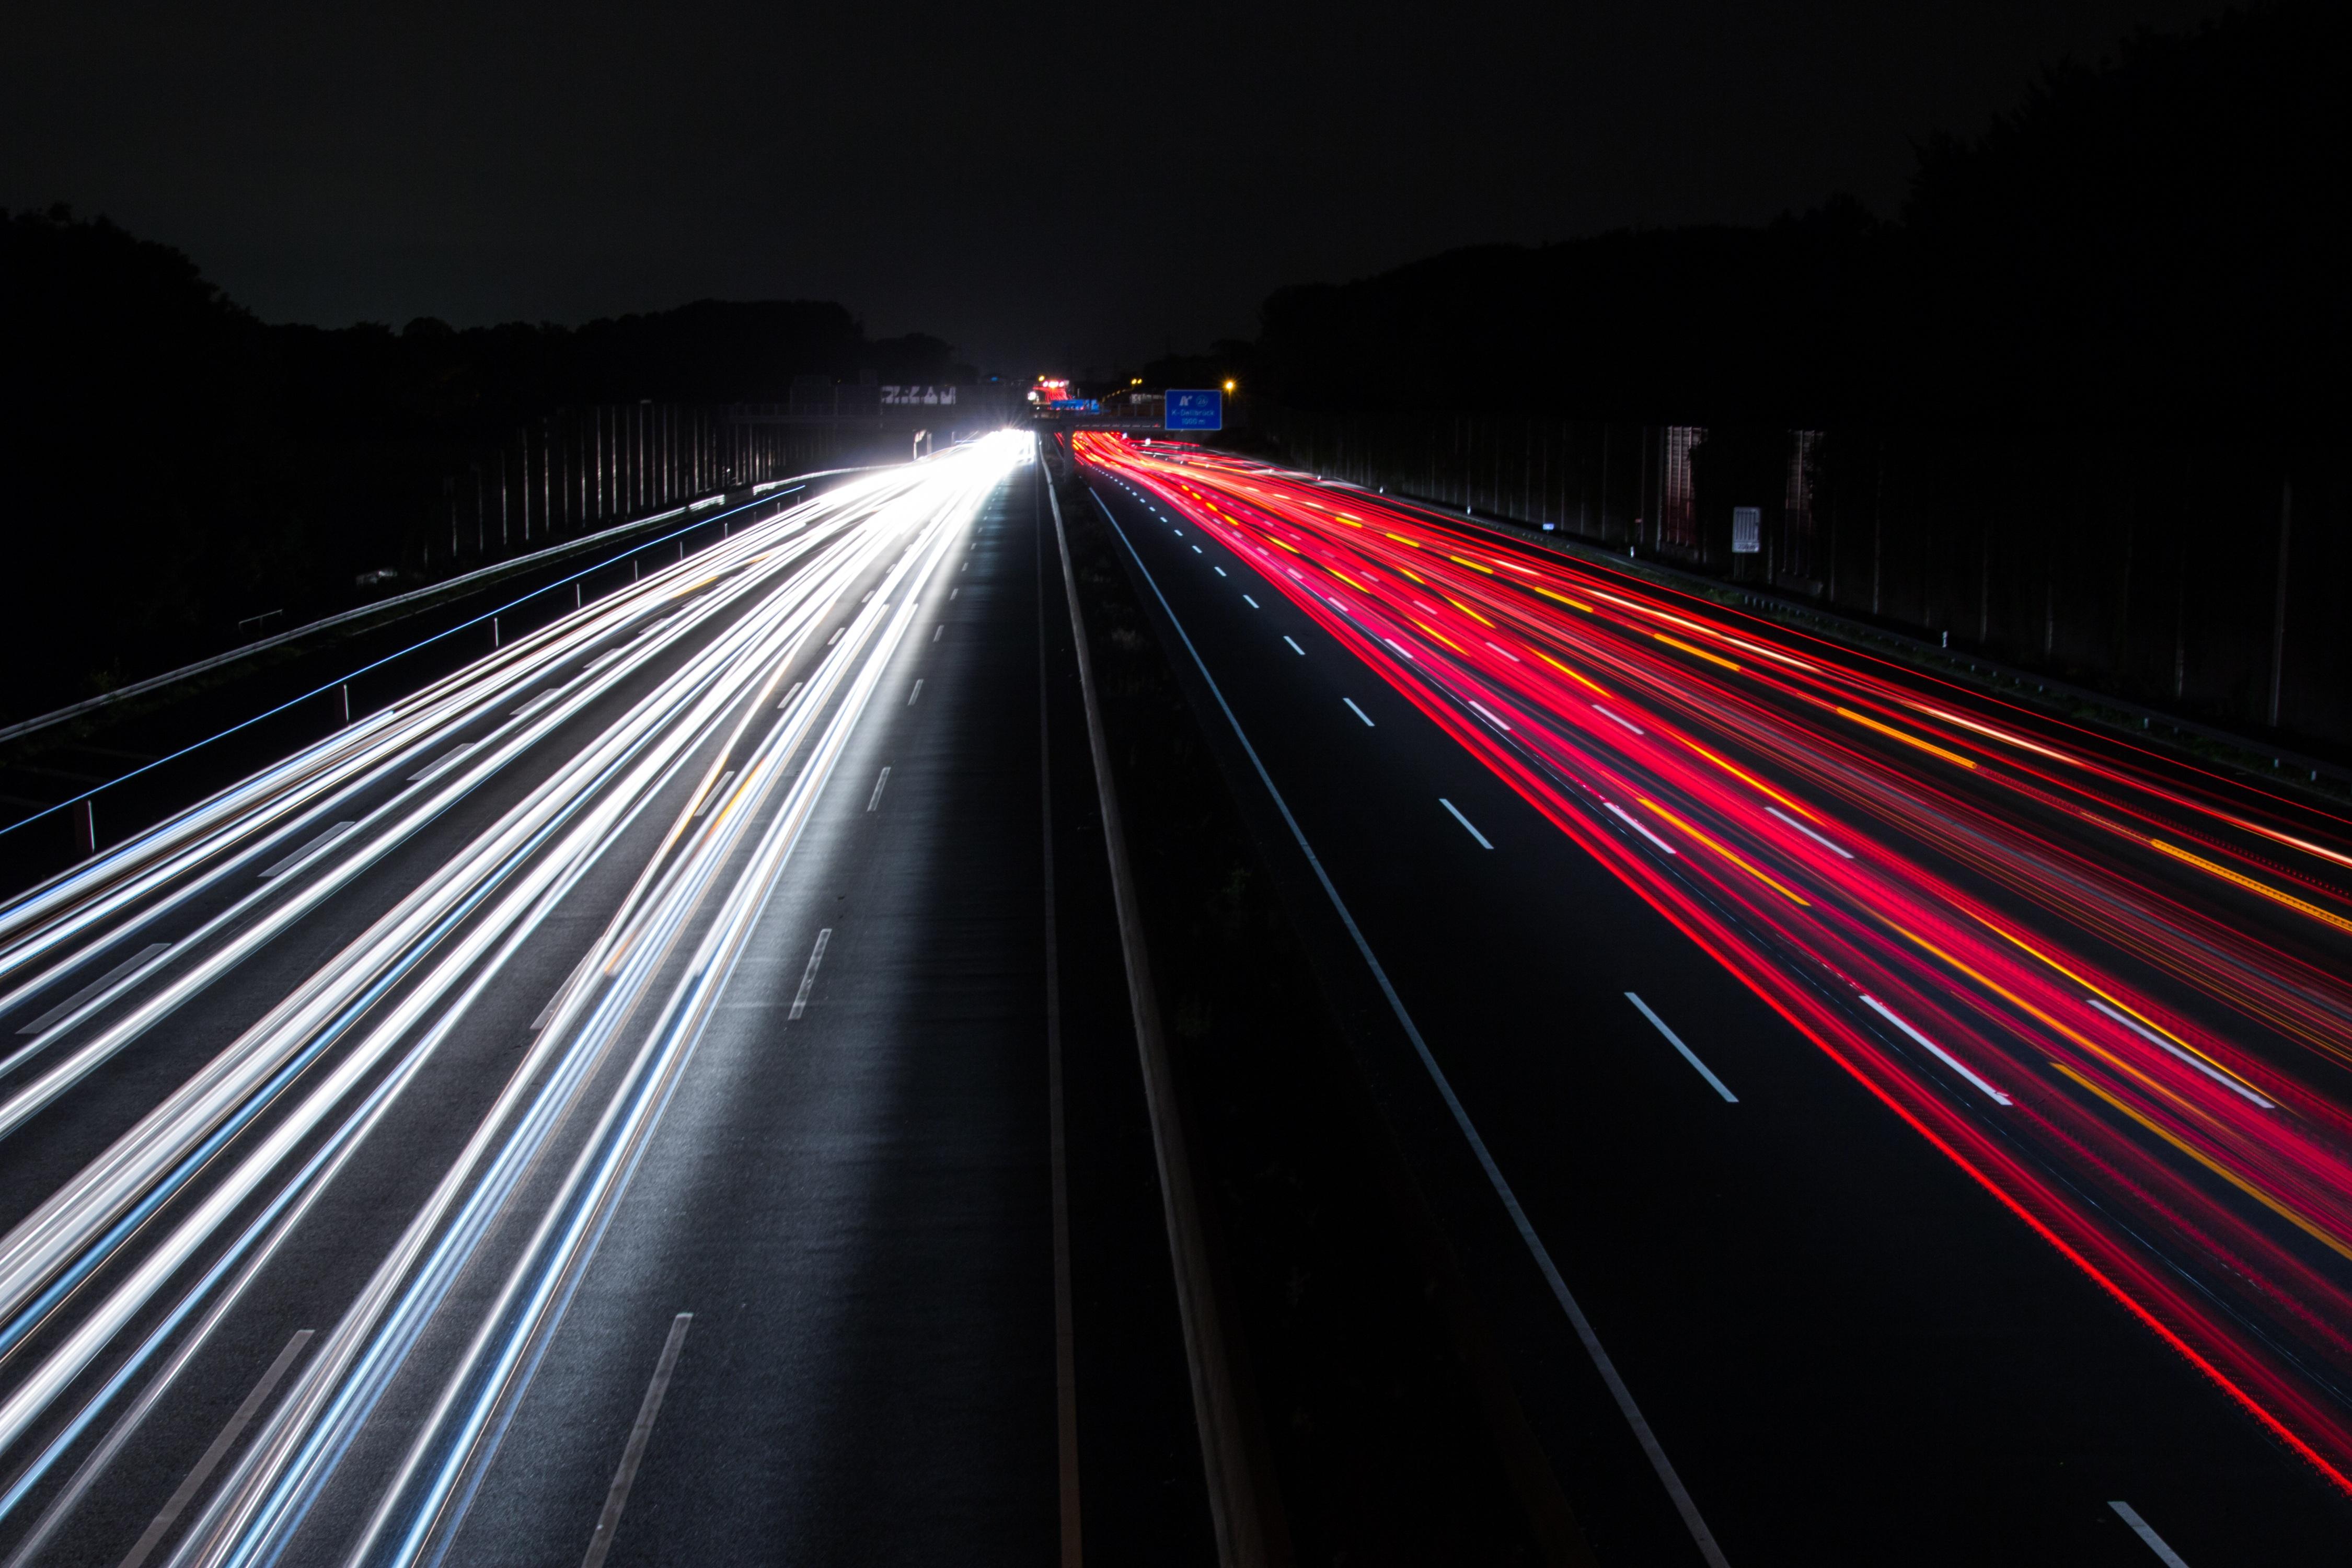 traffic-2007990.jpg